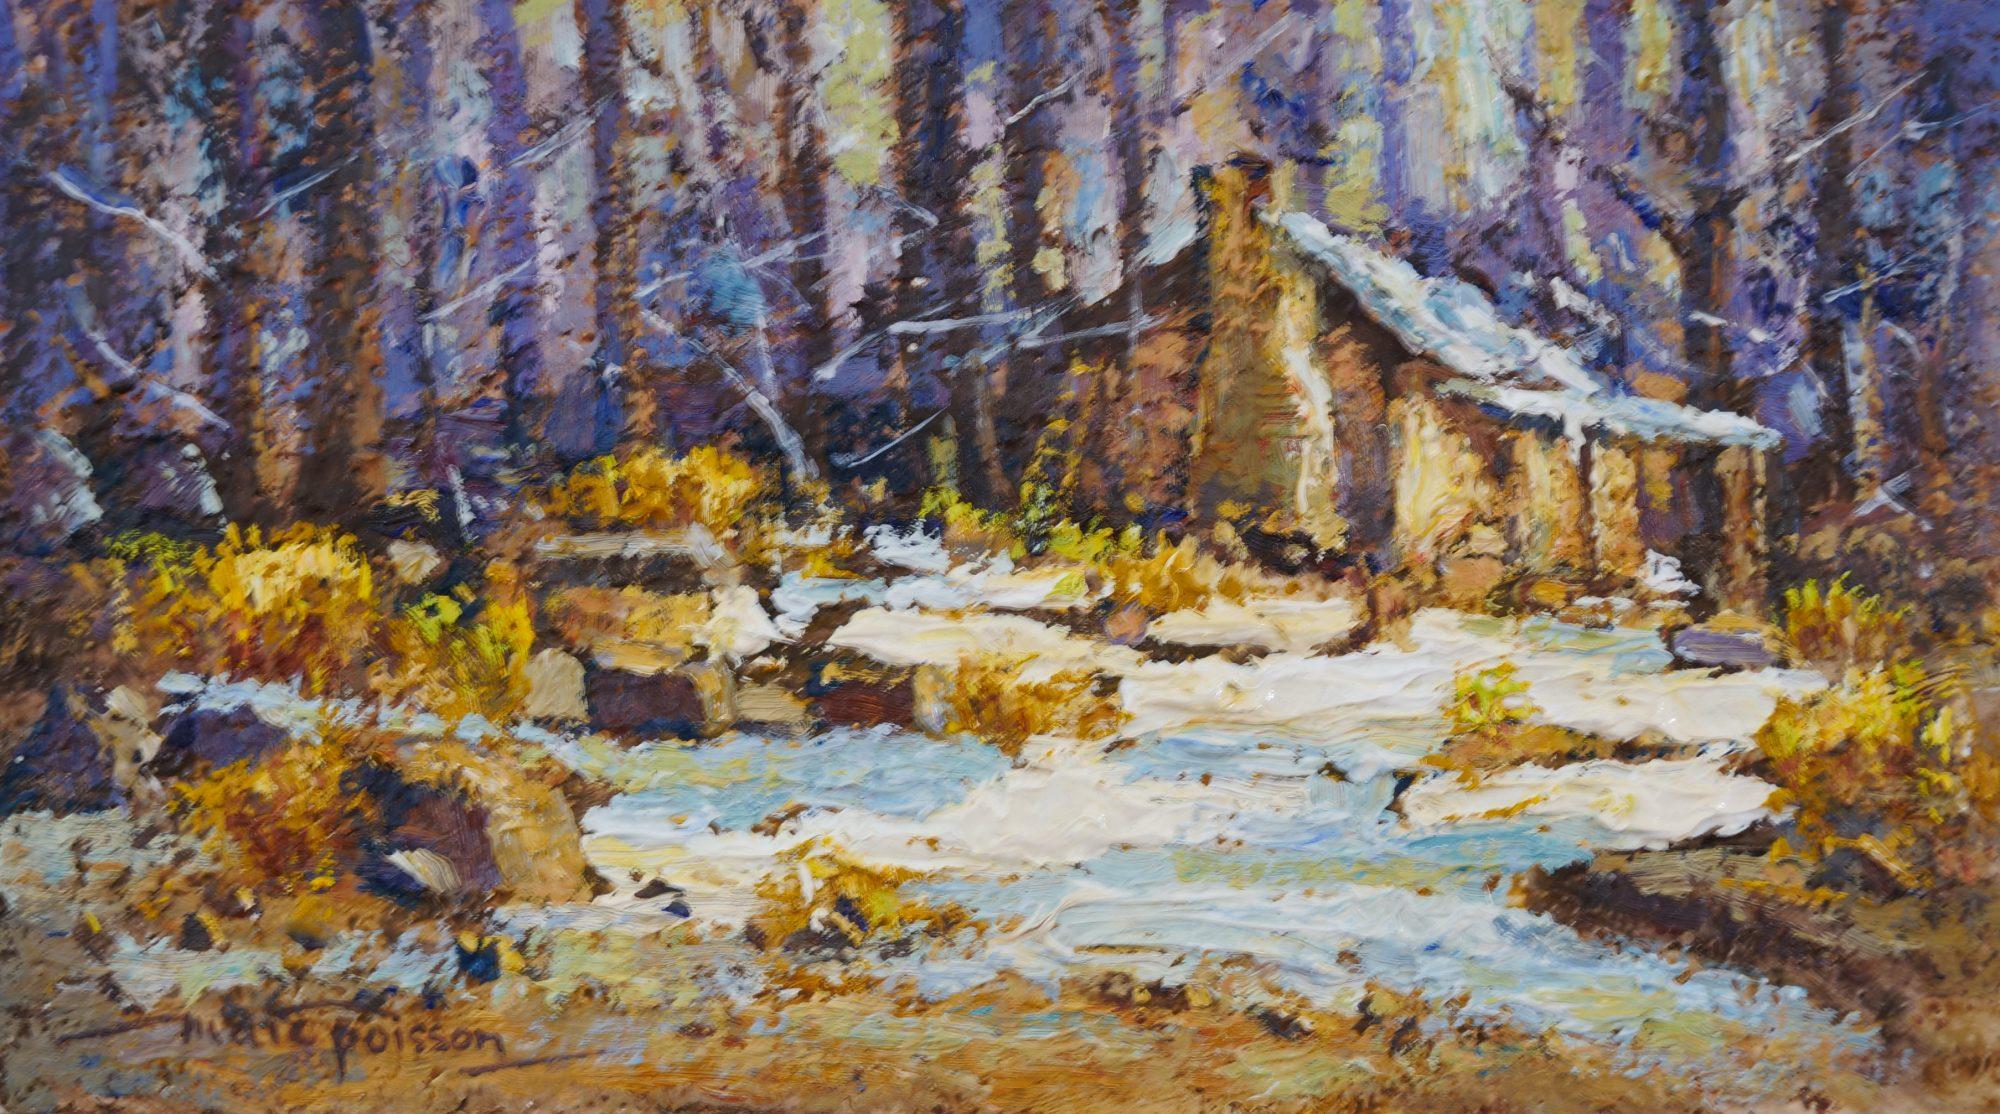 1106 12.7×22.8cm 105g Dogmans Hut Snowy Mtns Vic